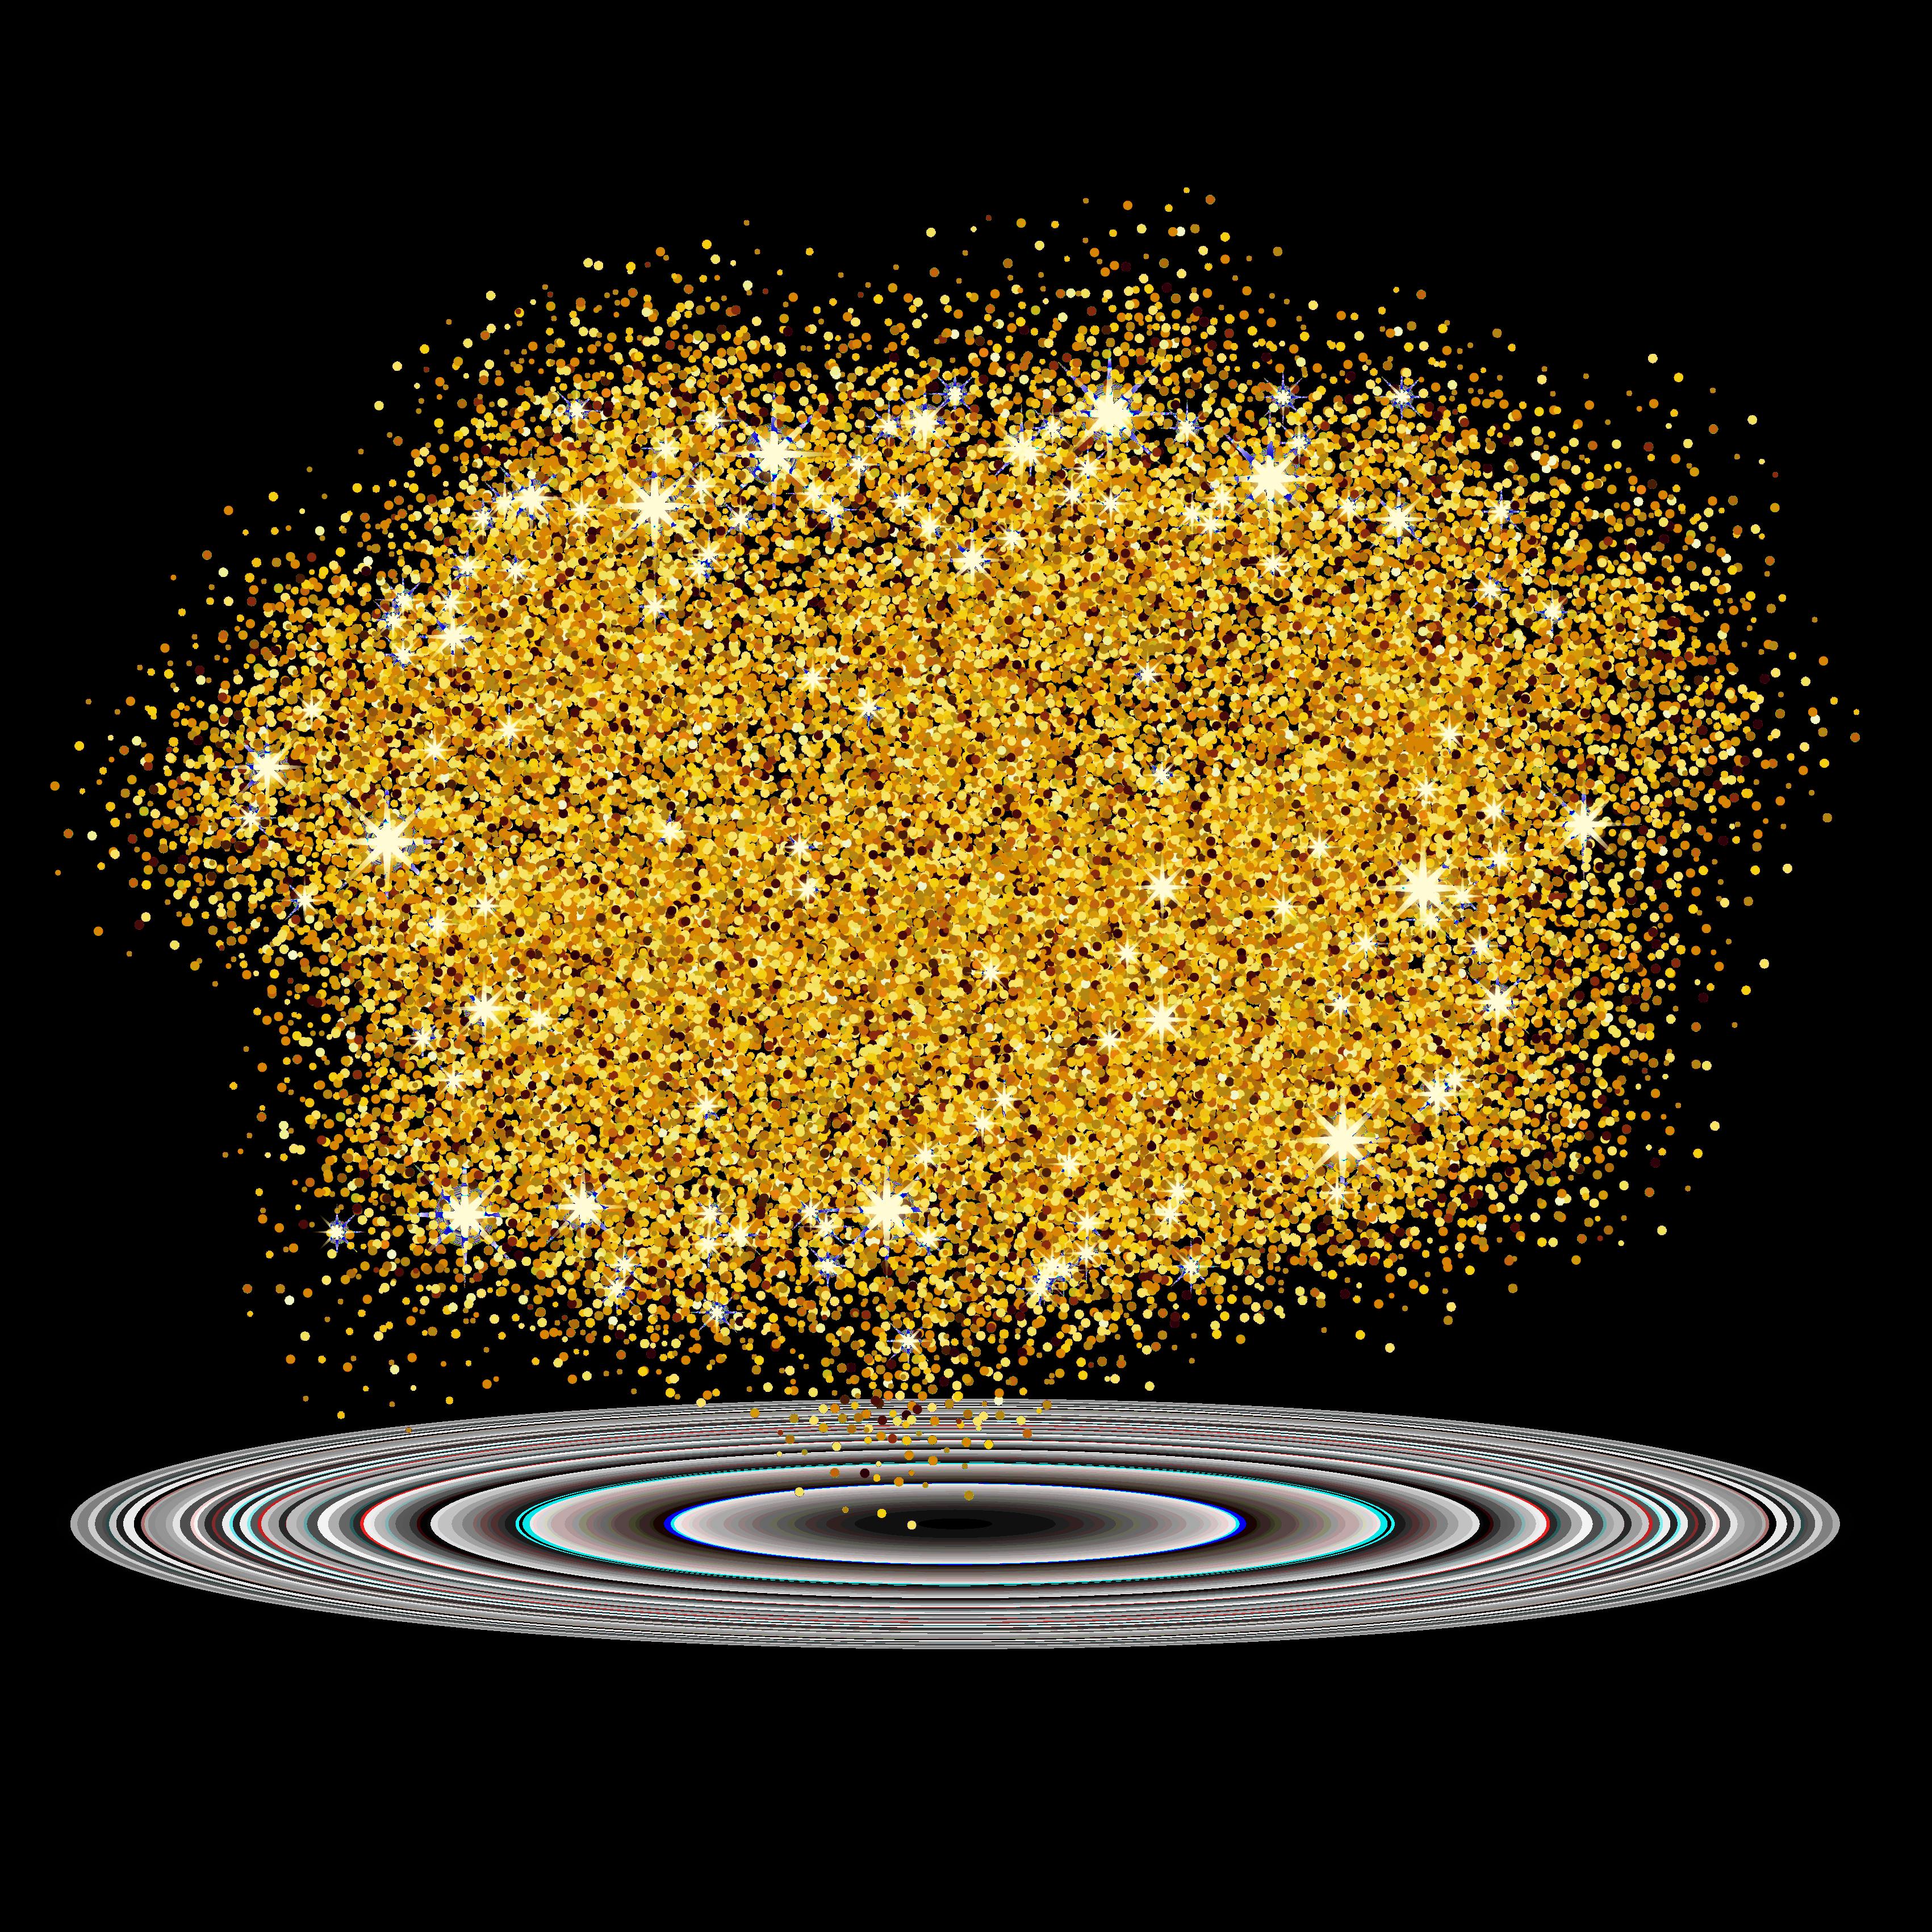 Clipart castle gold glitter. Desktop wallpaper clip art